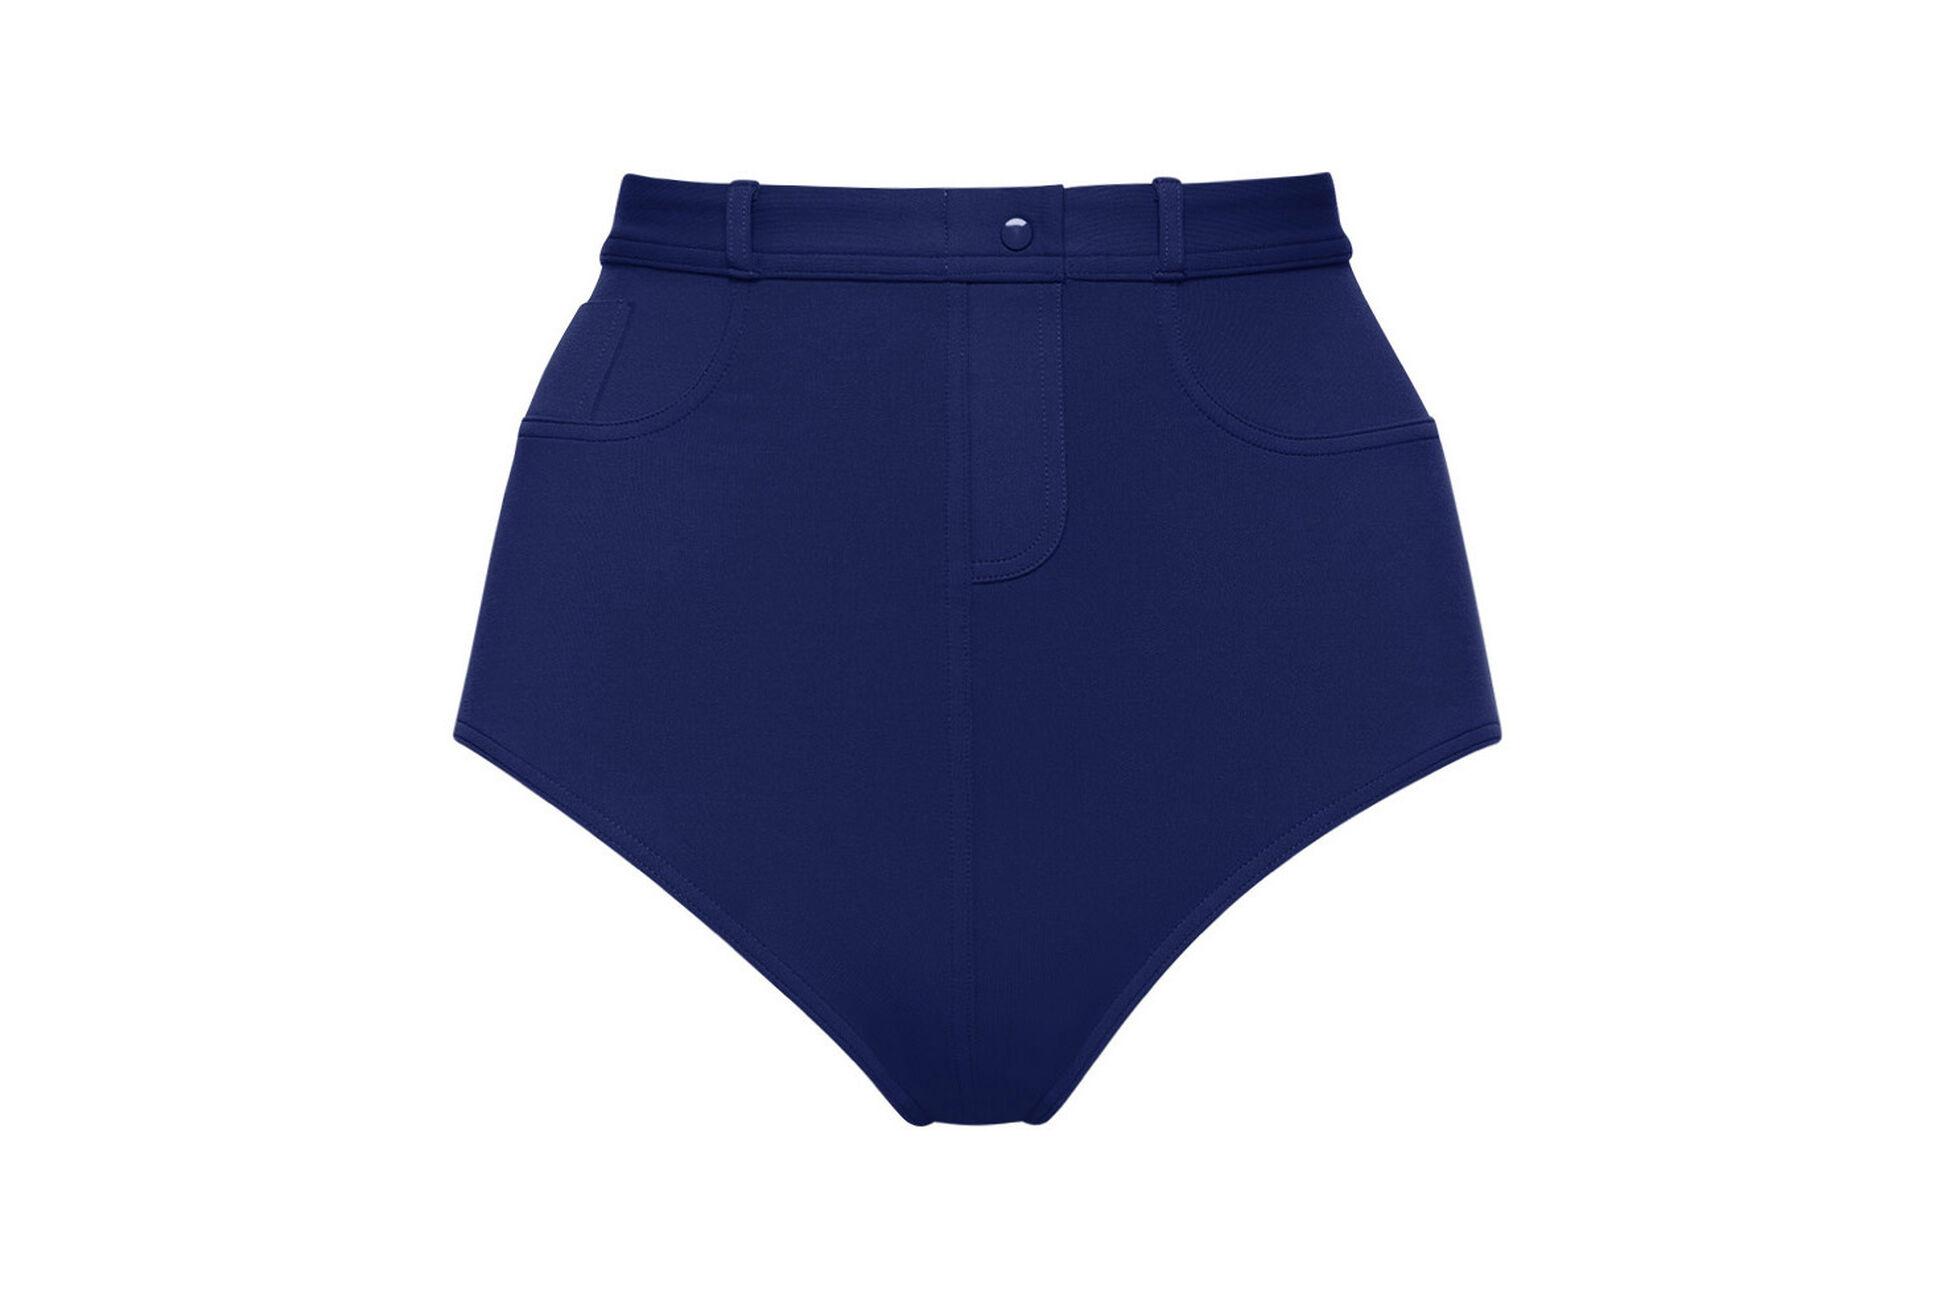 Stonewash High-waisted bikini briefs standard view �